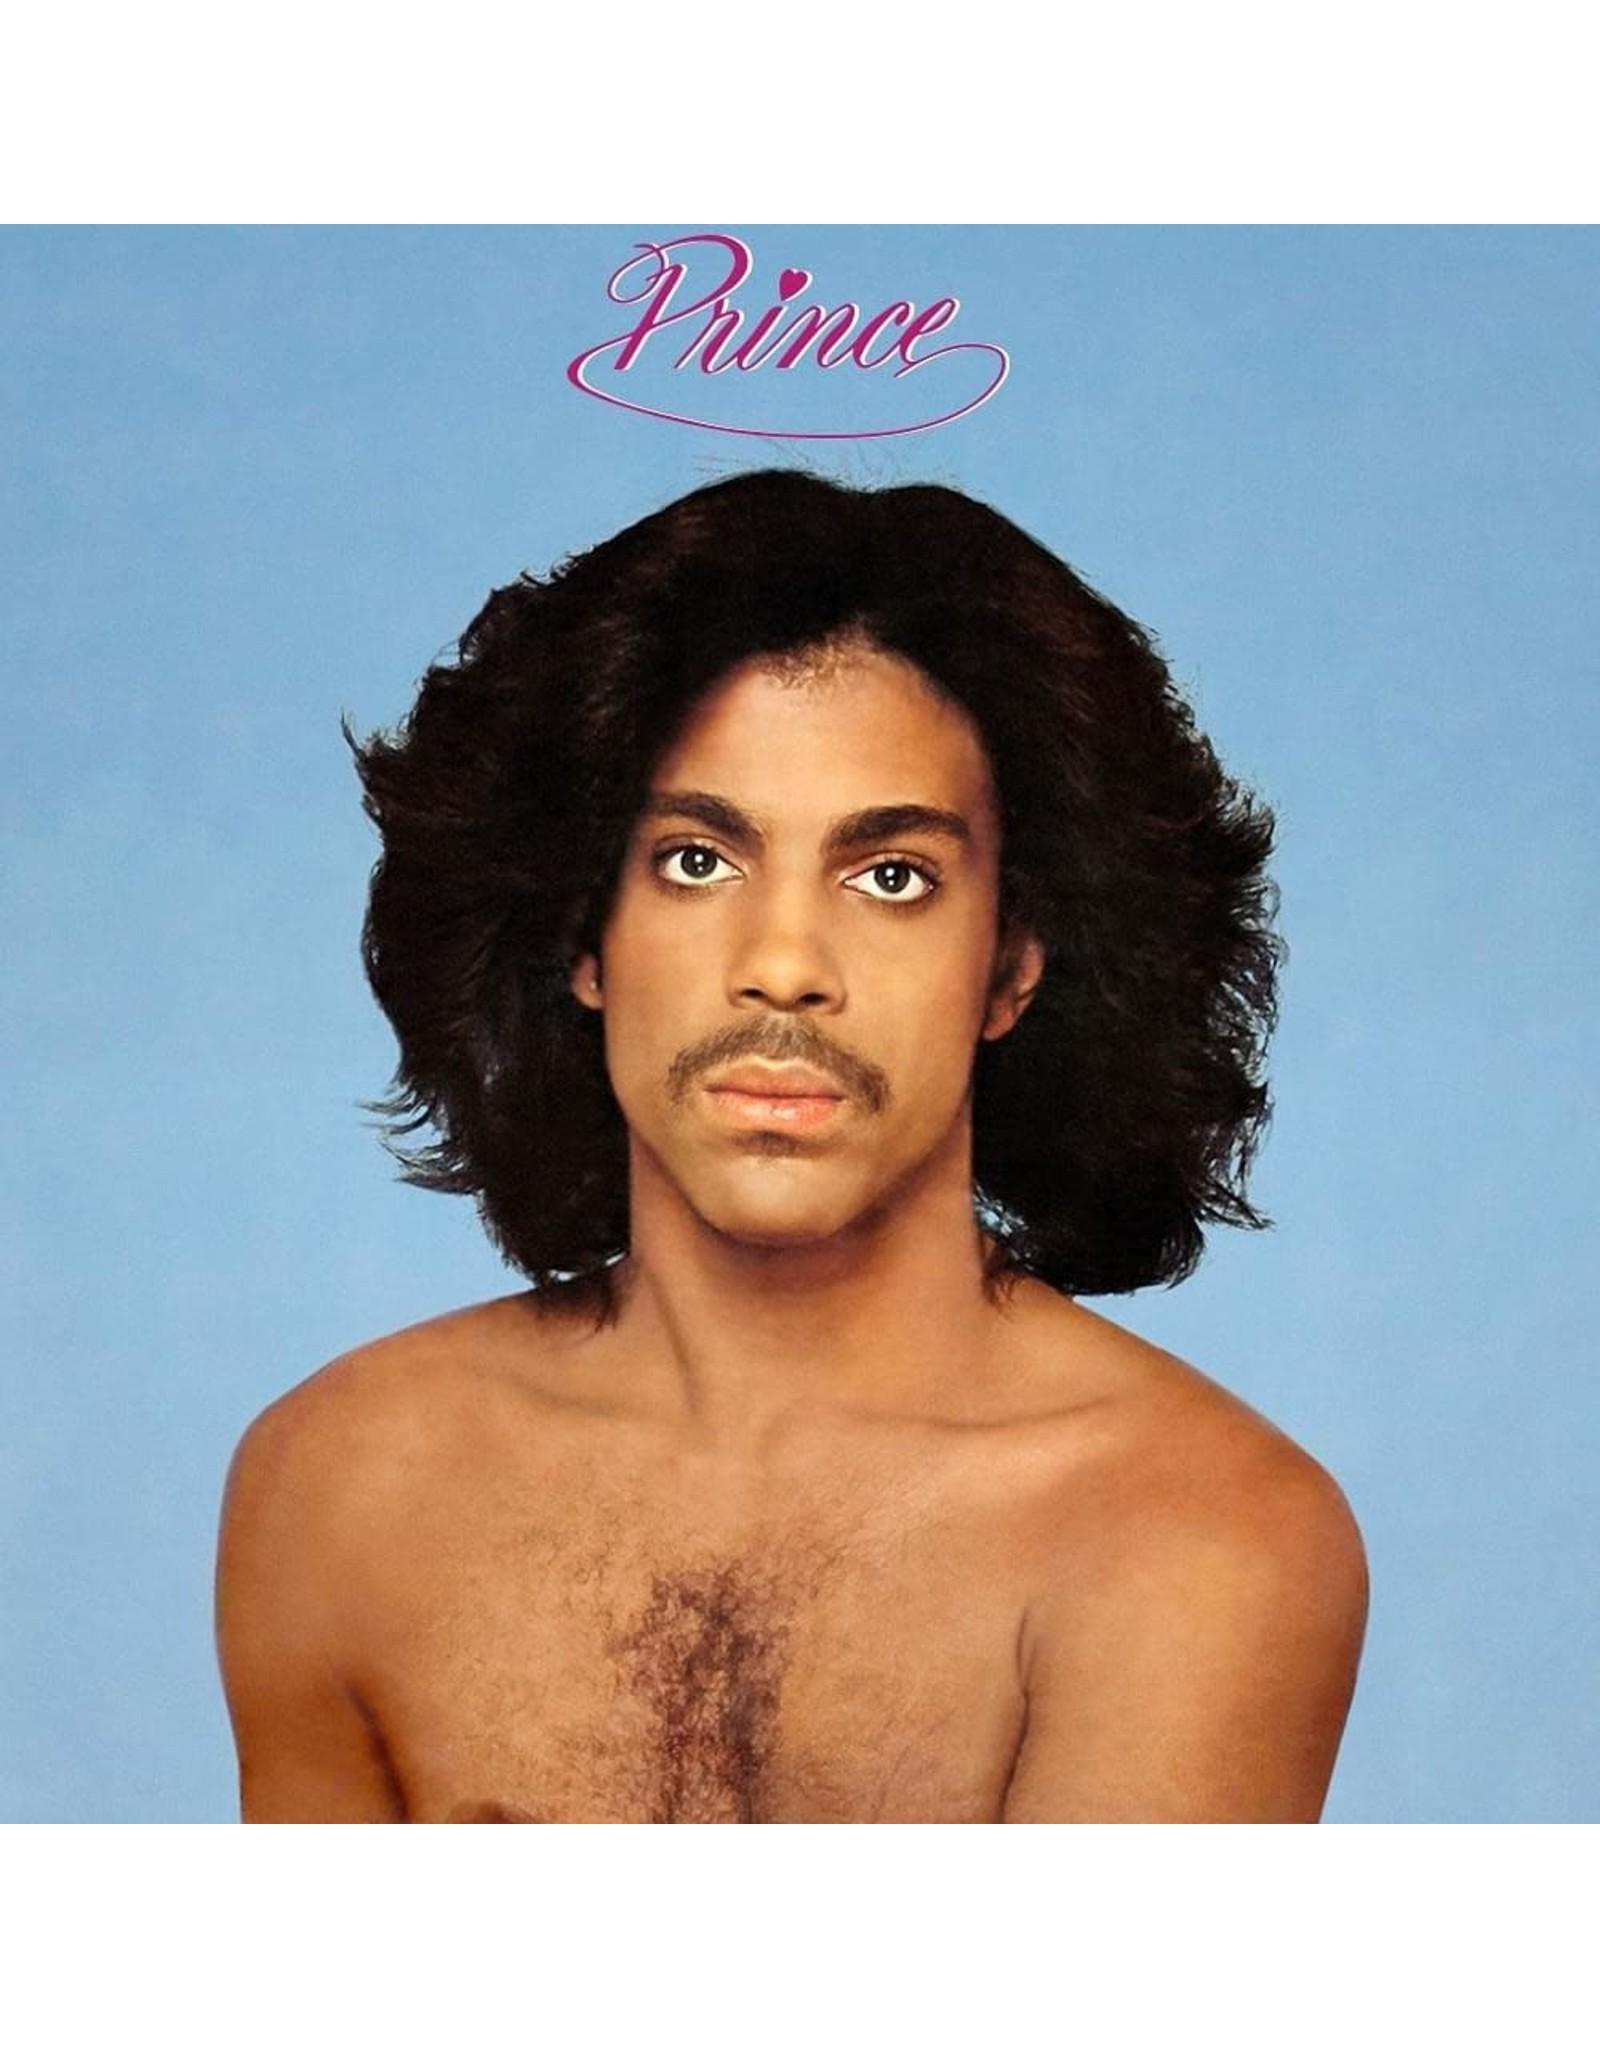 Prince - S/T LP